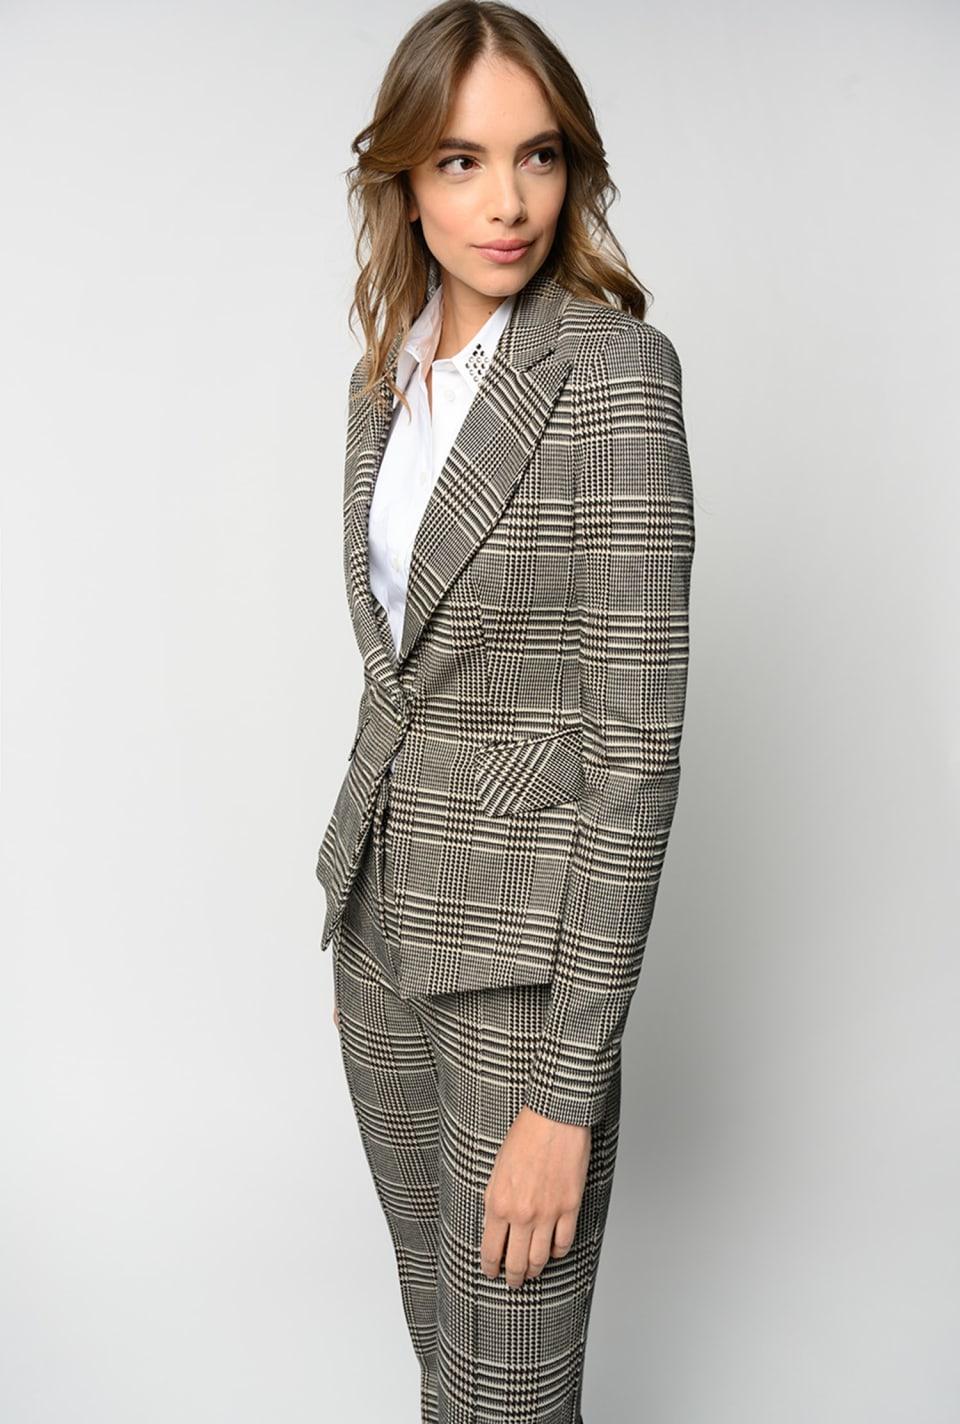 Prince-of-Wales pattern blazer - Pinko